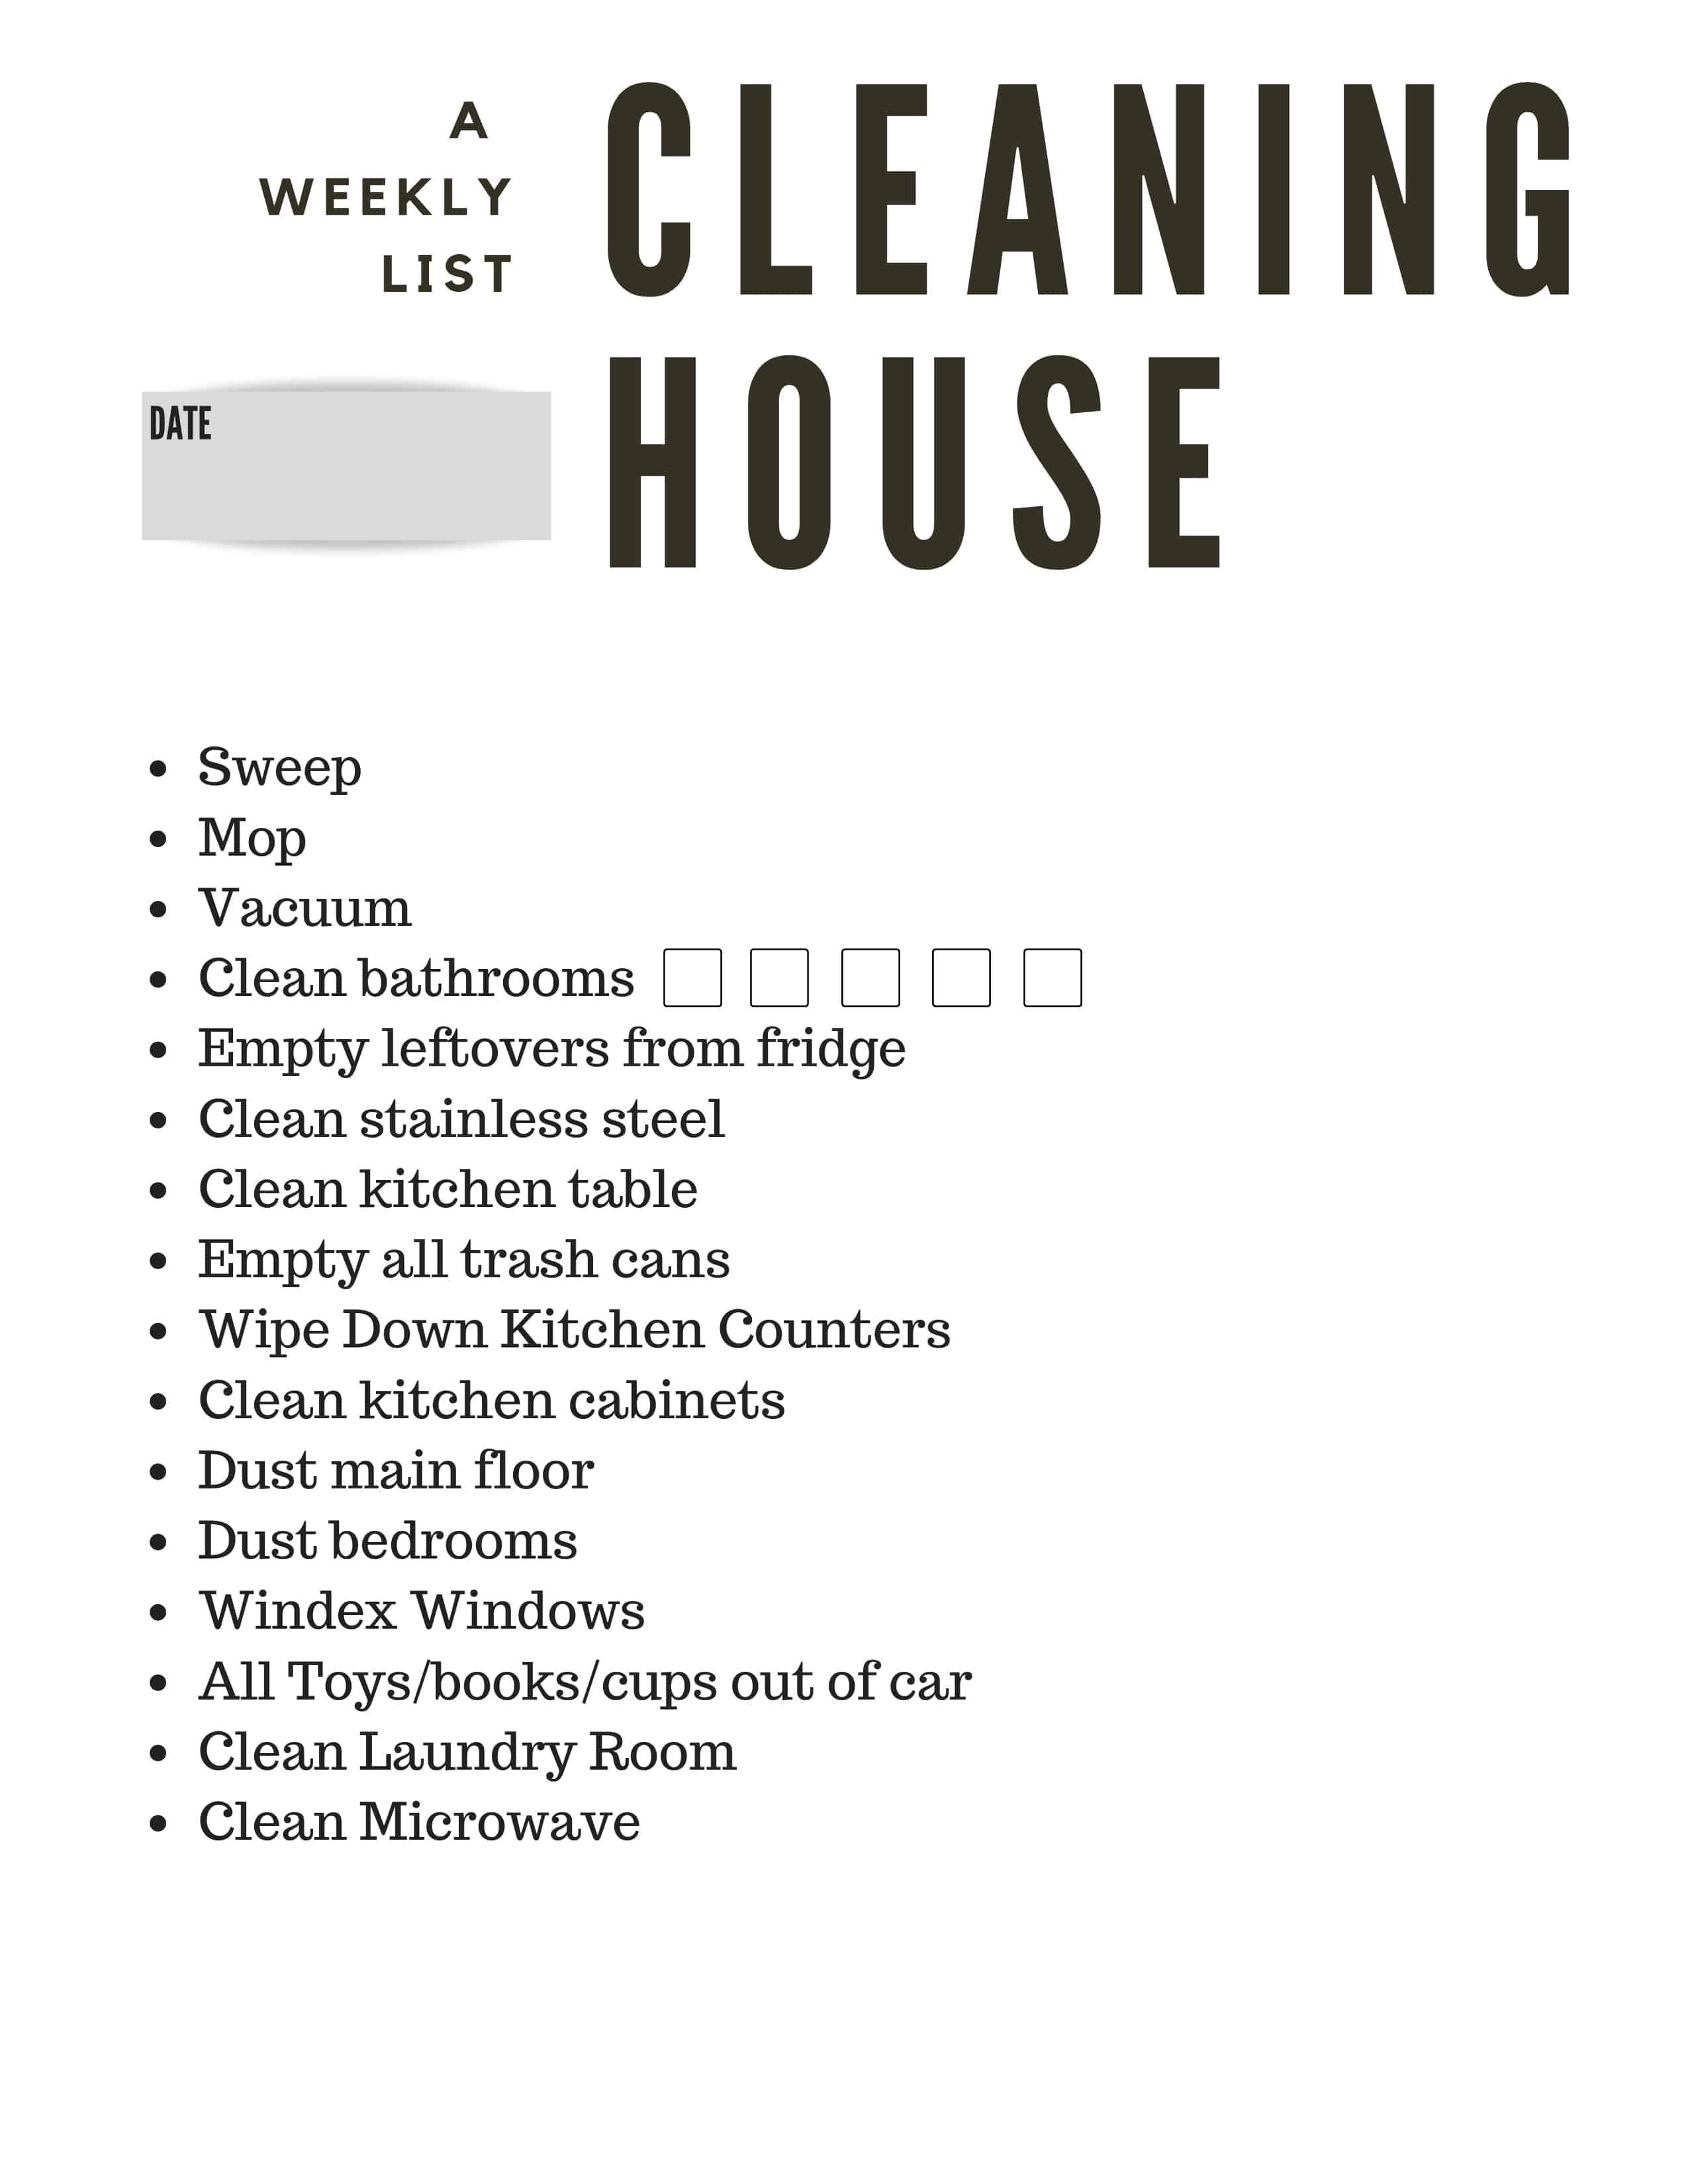 Free printable weekly cleaning list